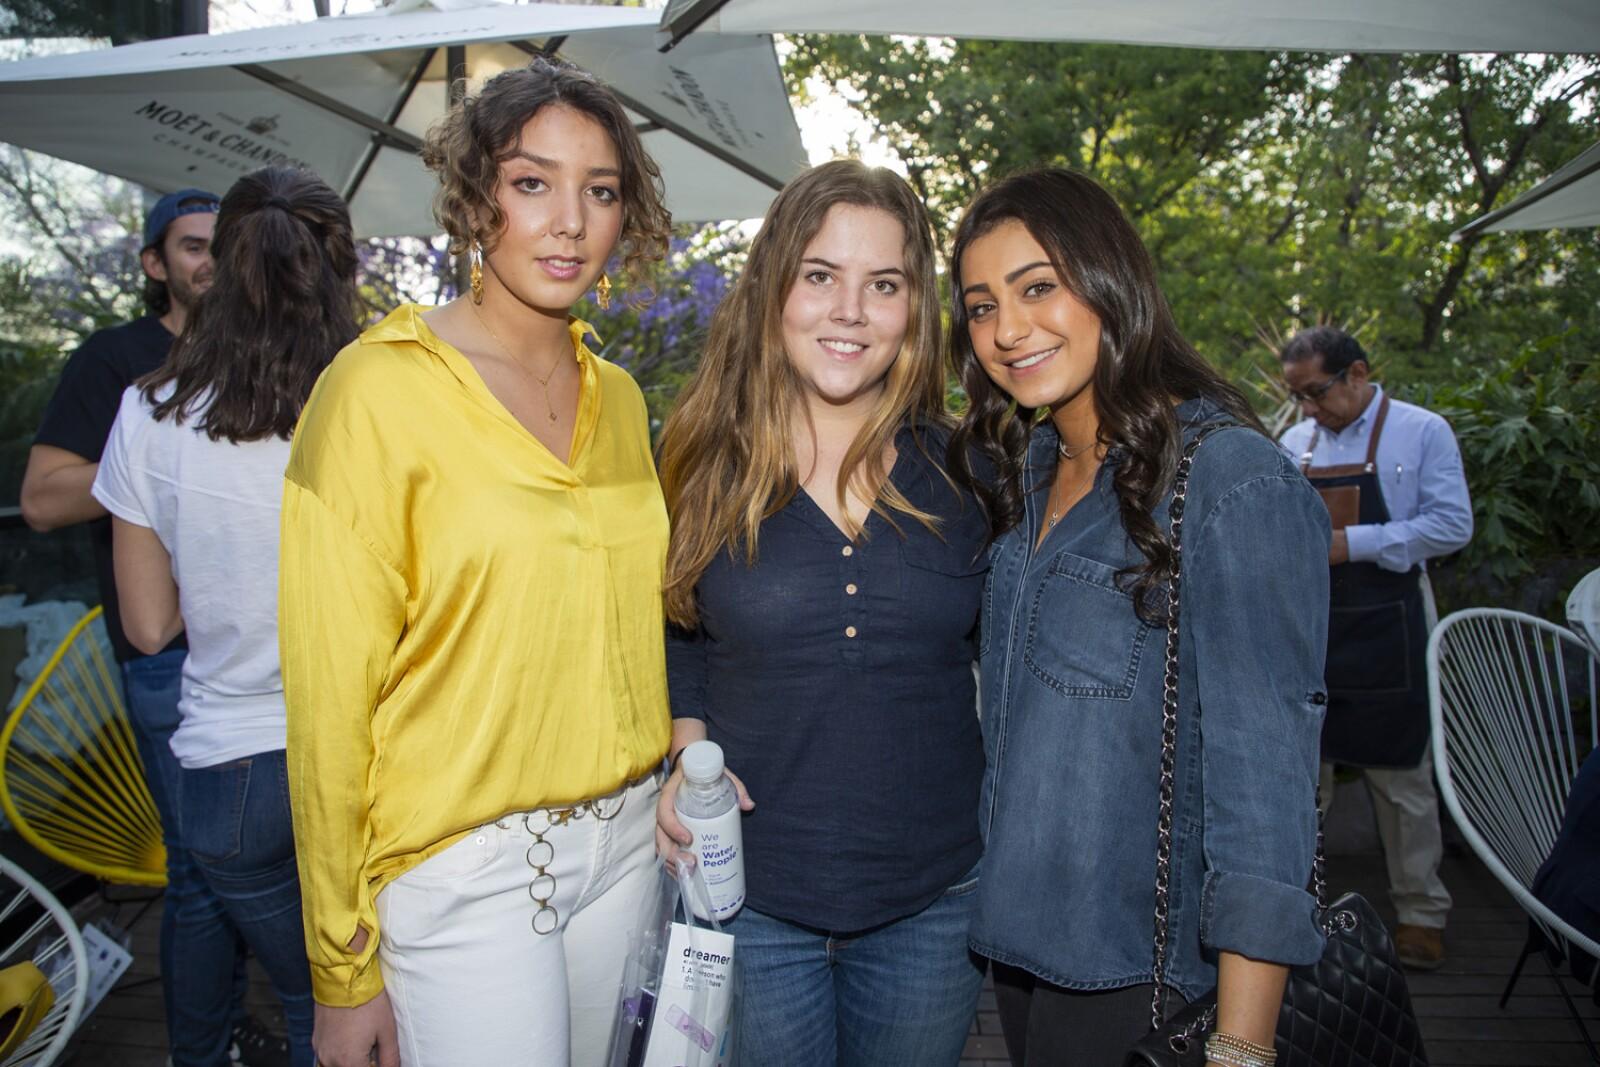 Paulina Sanchez, Marene Arce, Michelle Sarquis